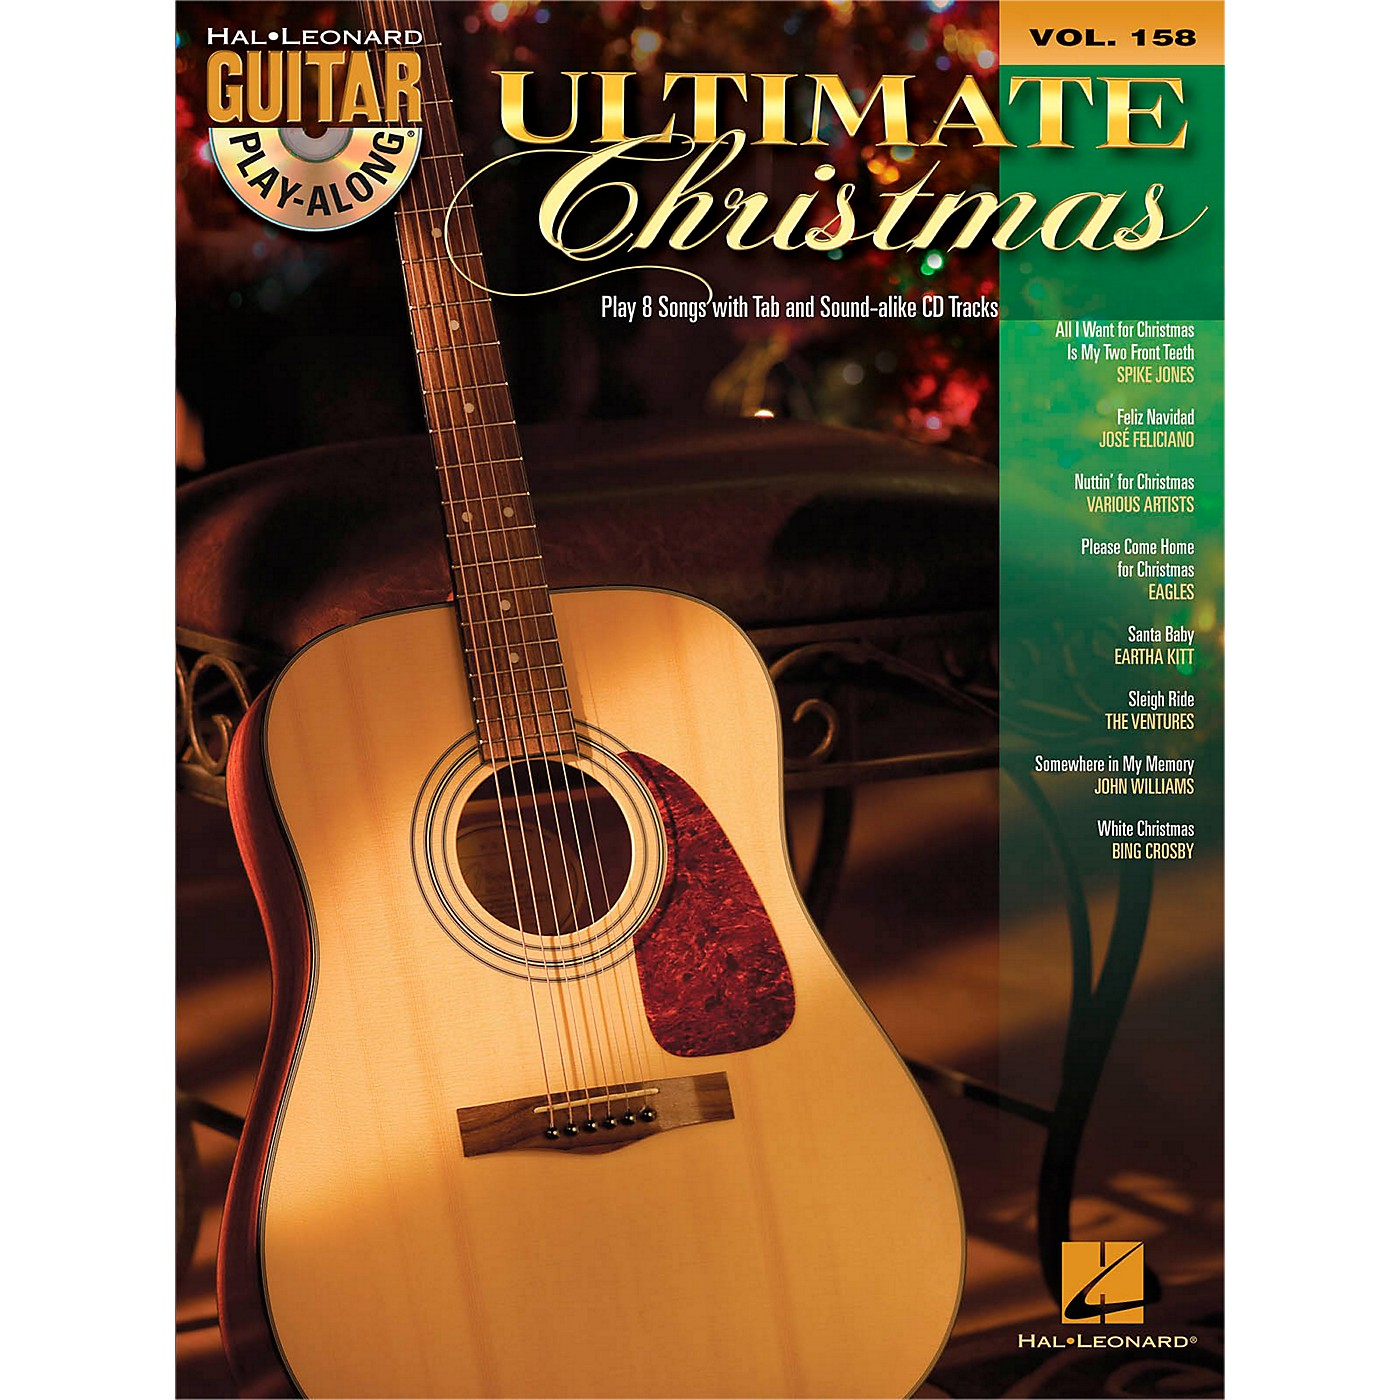 Hal Leonard Ultimate Christmas - Guitar Play-Along Vol. 158 Book/CD thumbnail